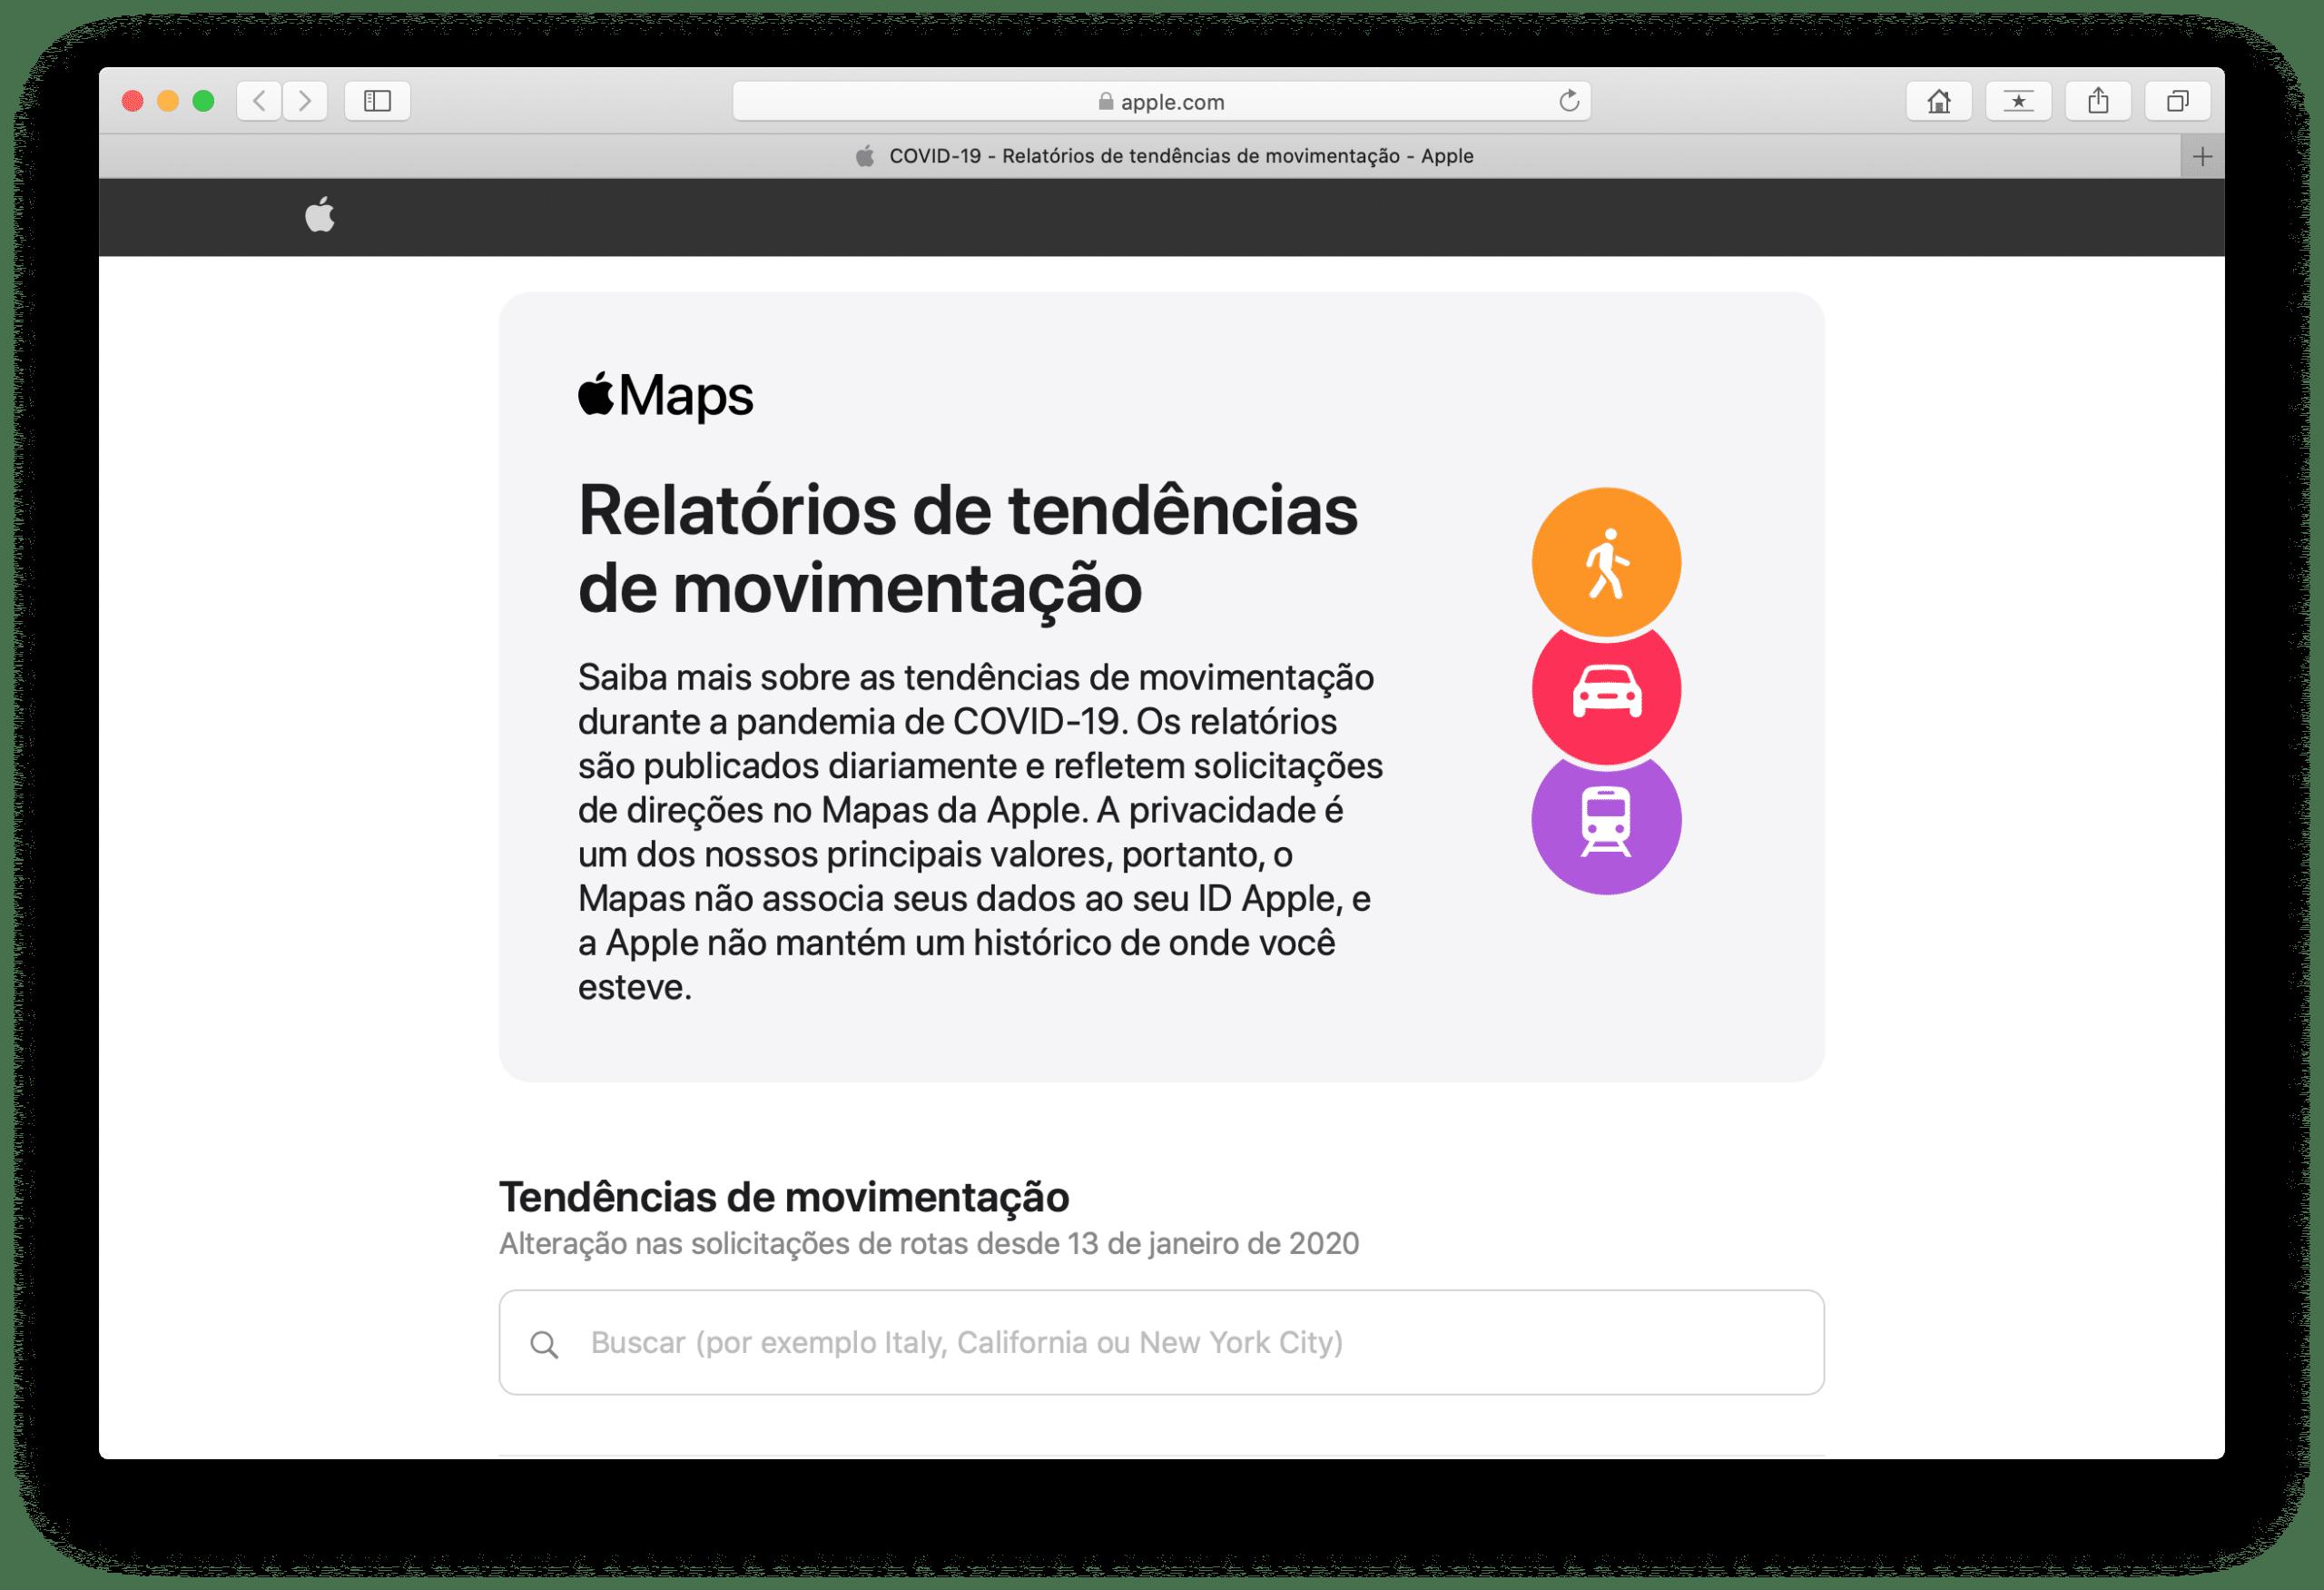 Apple movement trend reports